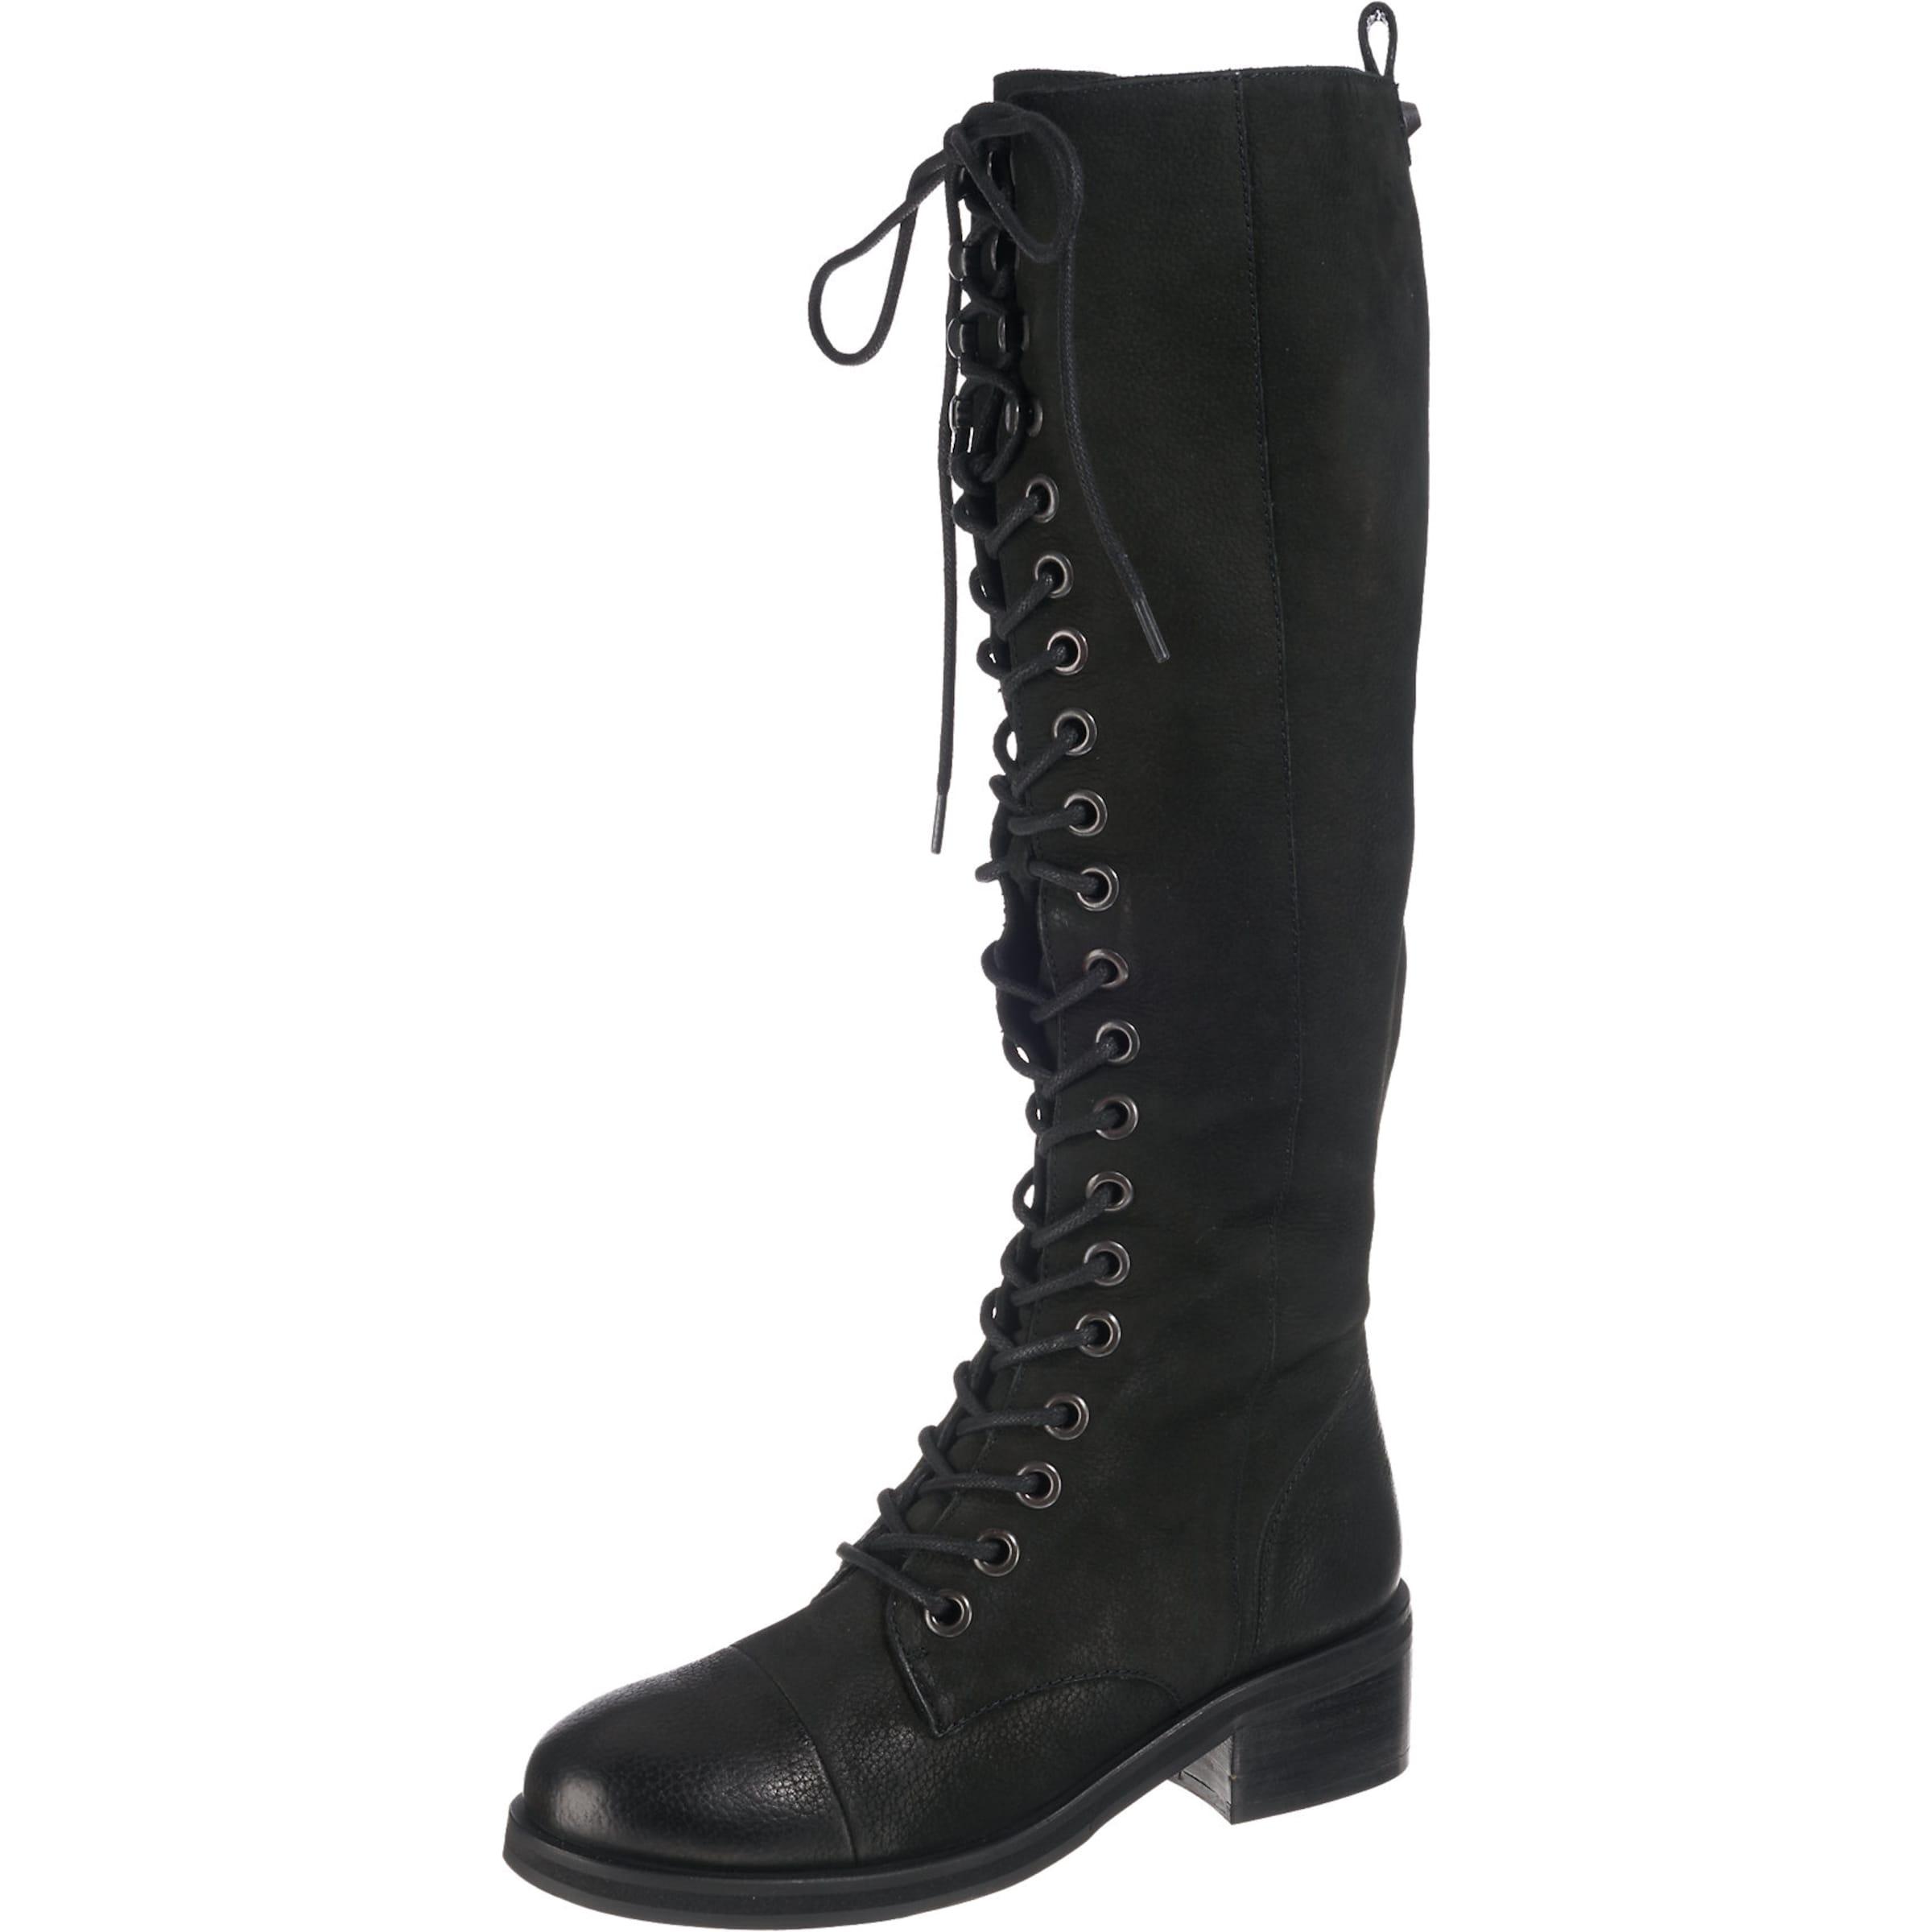 Haltbare Mode billige Schuhe SPM | Zac Klassische Klassische Klassische Stiefel Schuhe Gut getragene Schuhe 7689dd